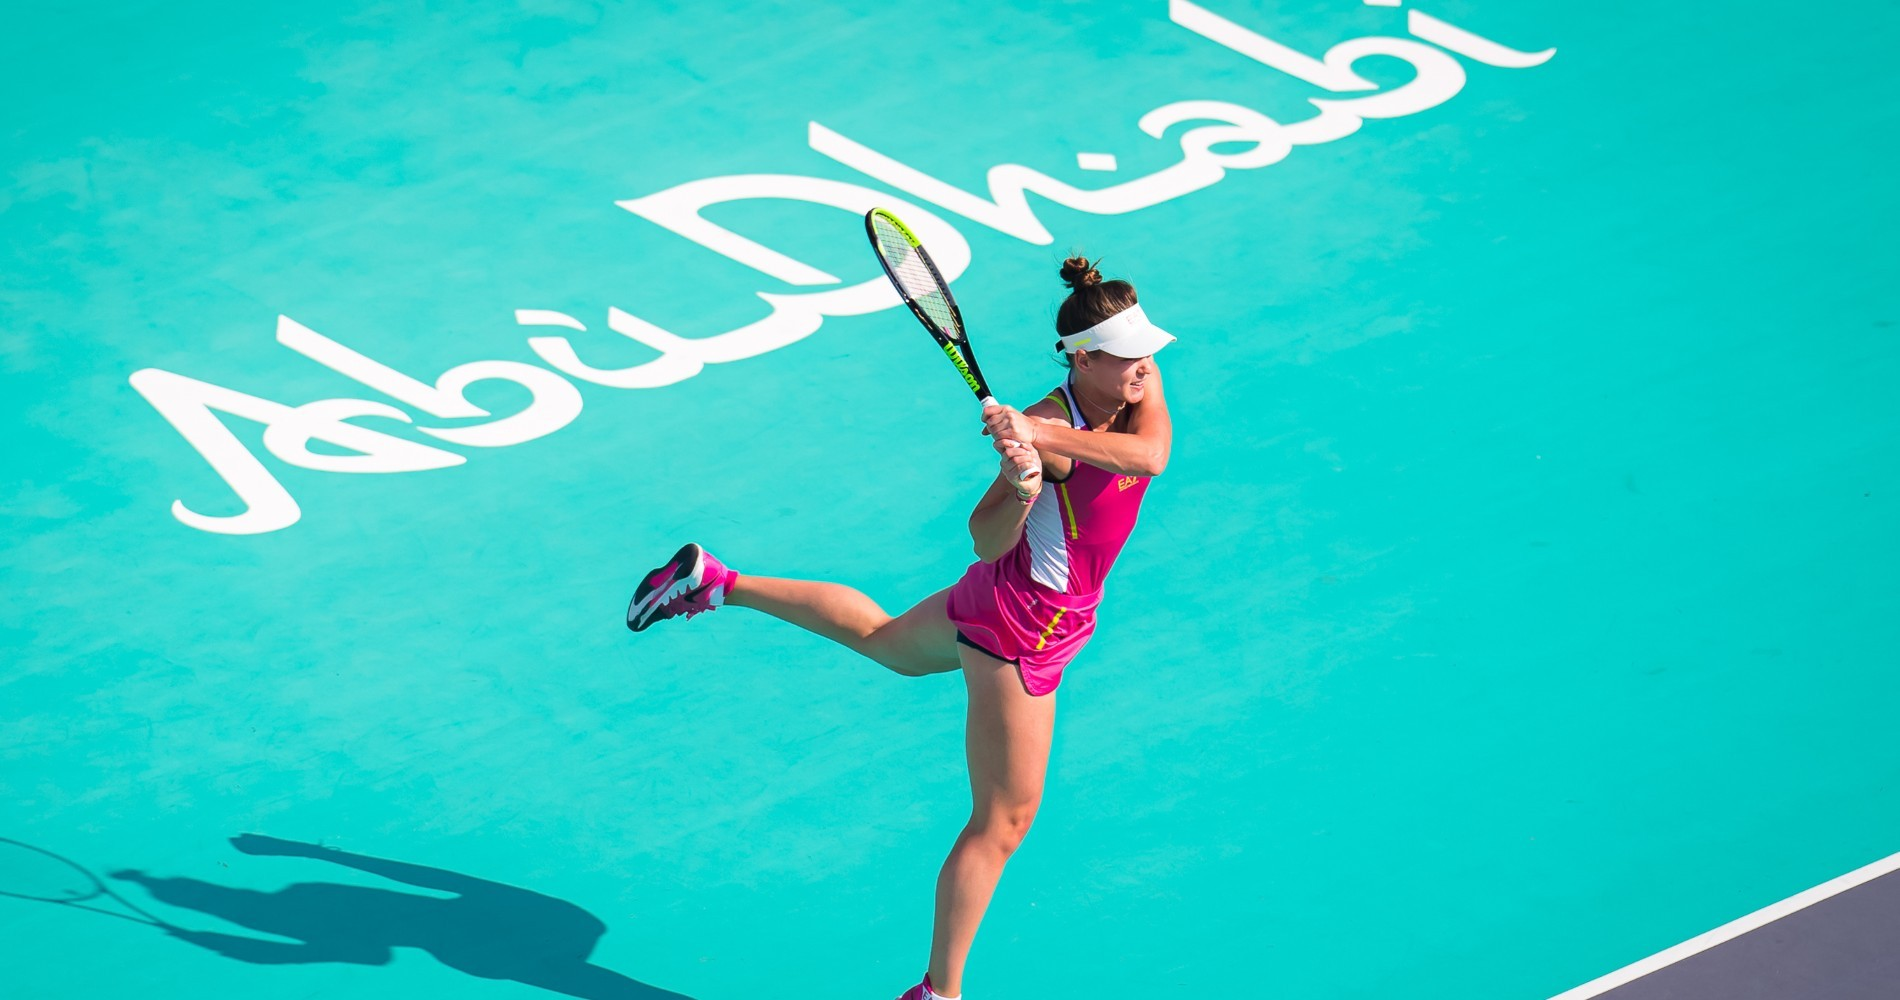 Veronika Kudermetova, Abu Dhabi, 2021